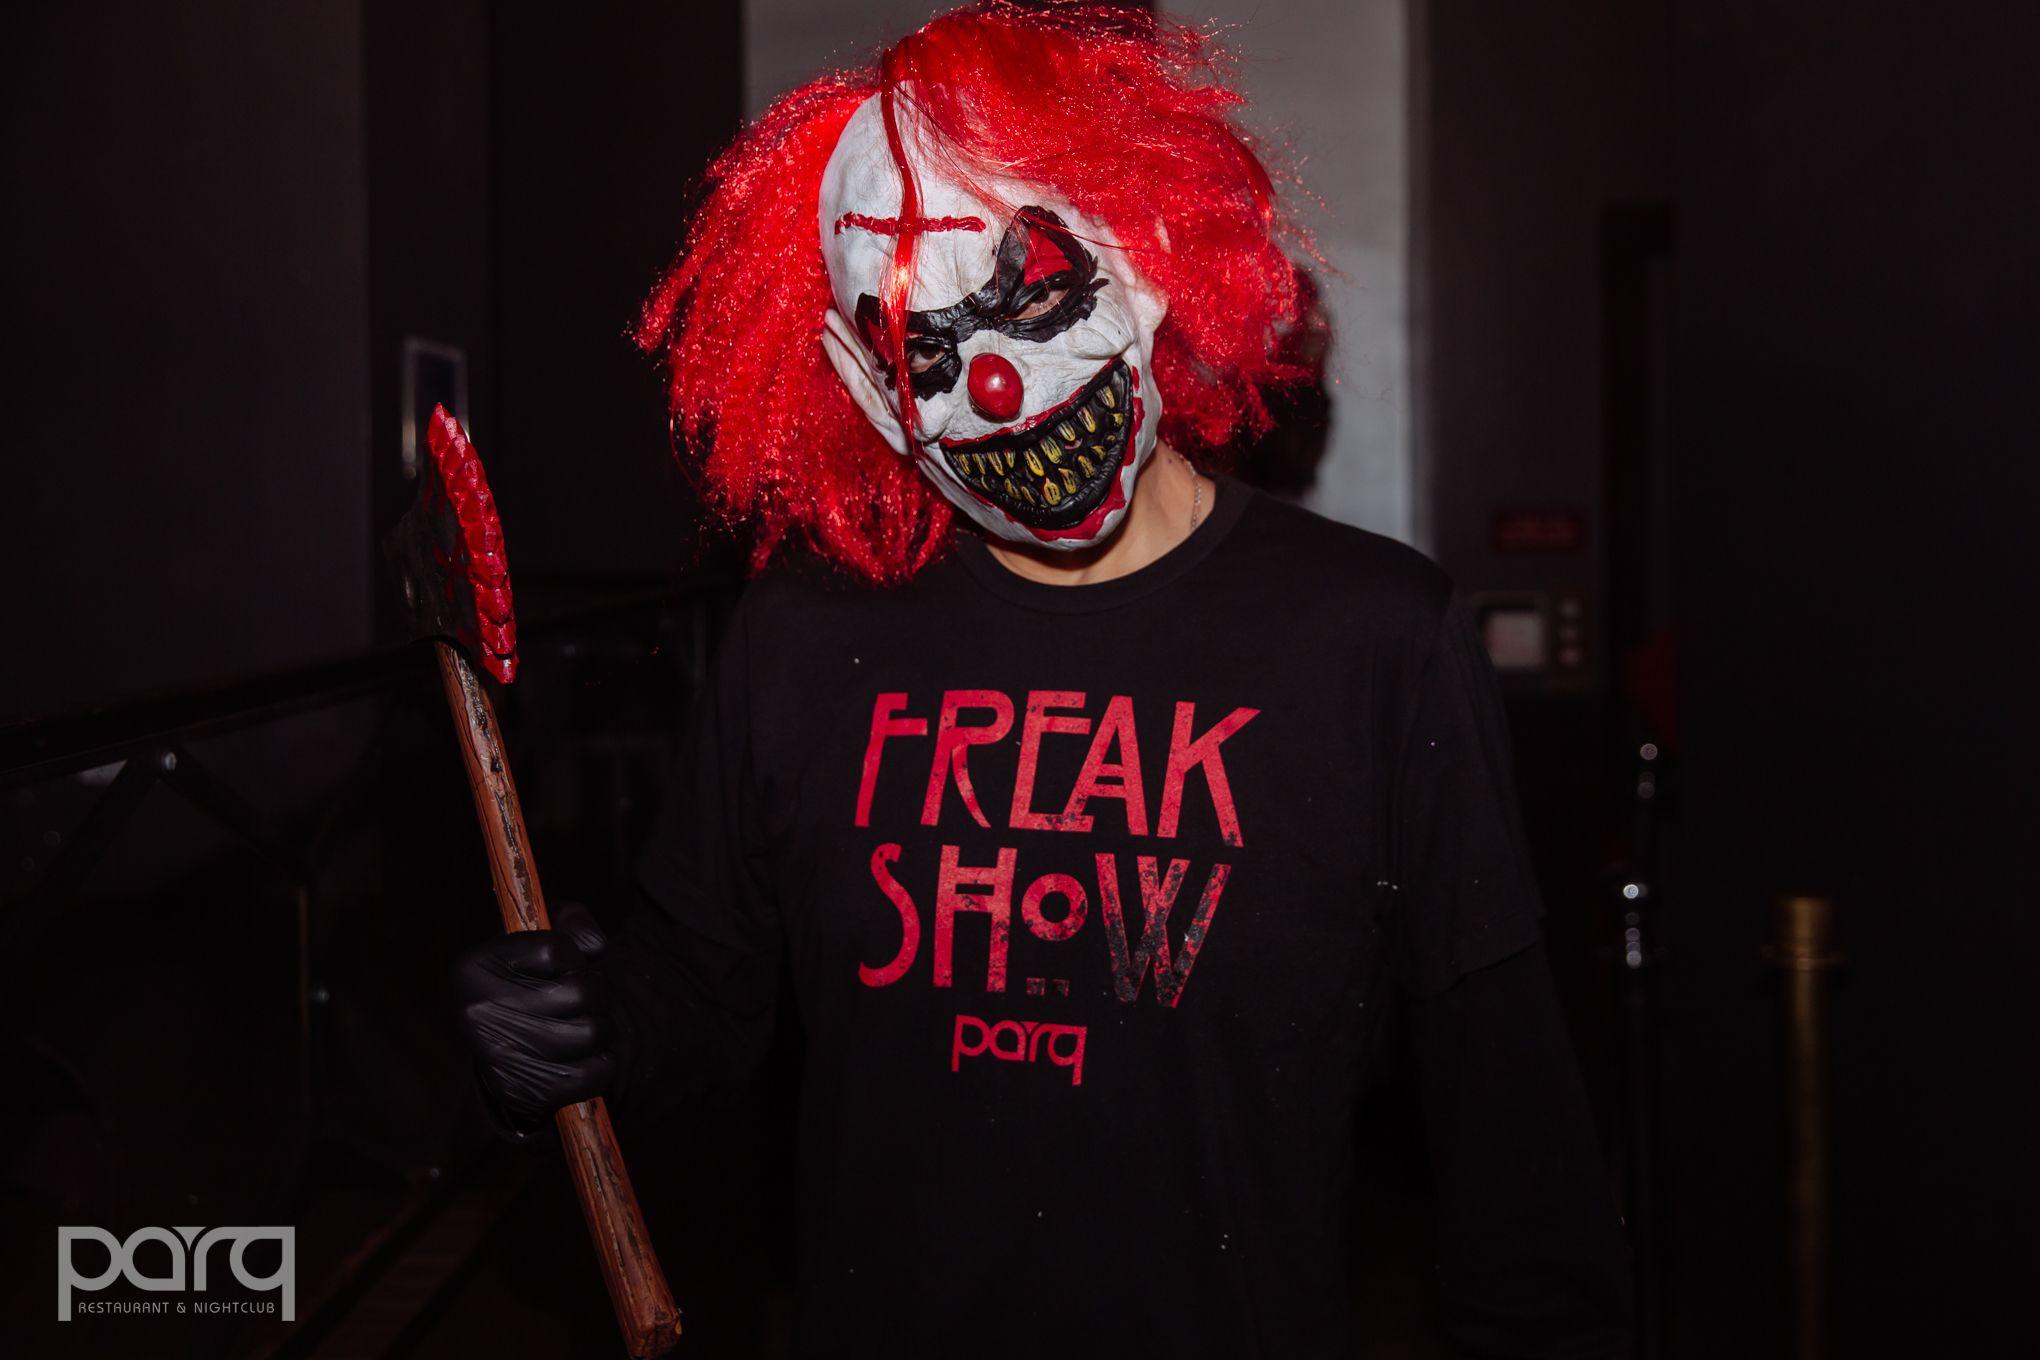 10.26.19 Parq - Halloween Gallery-11.jpg